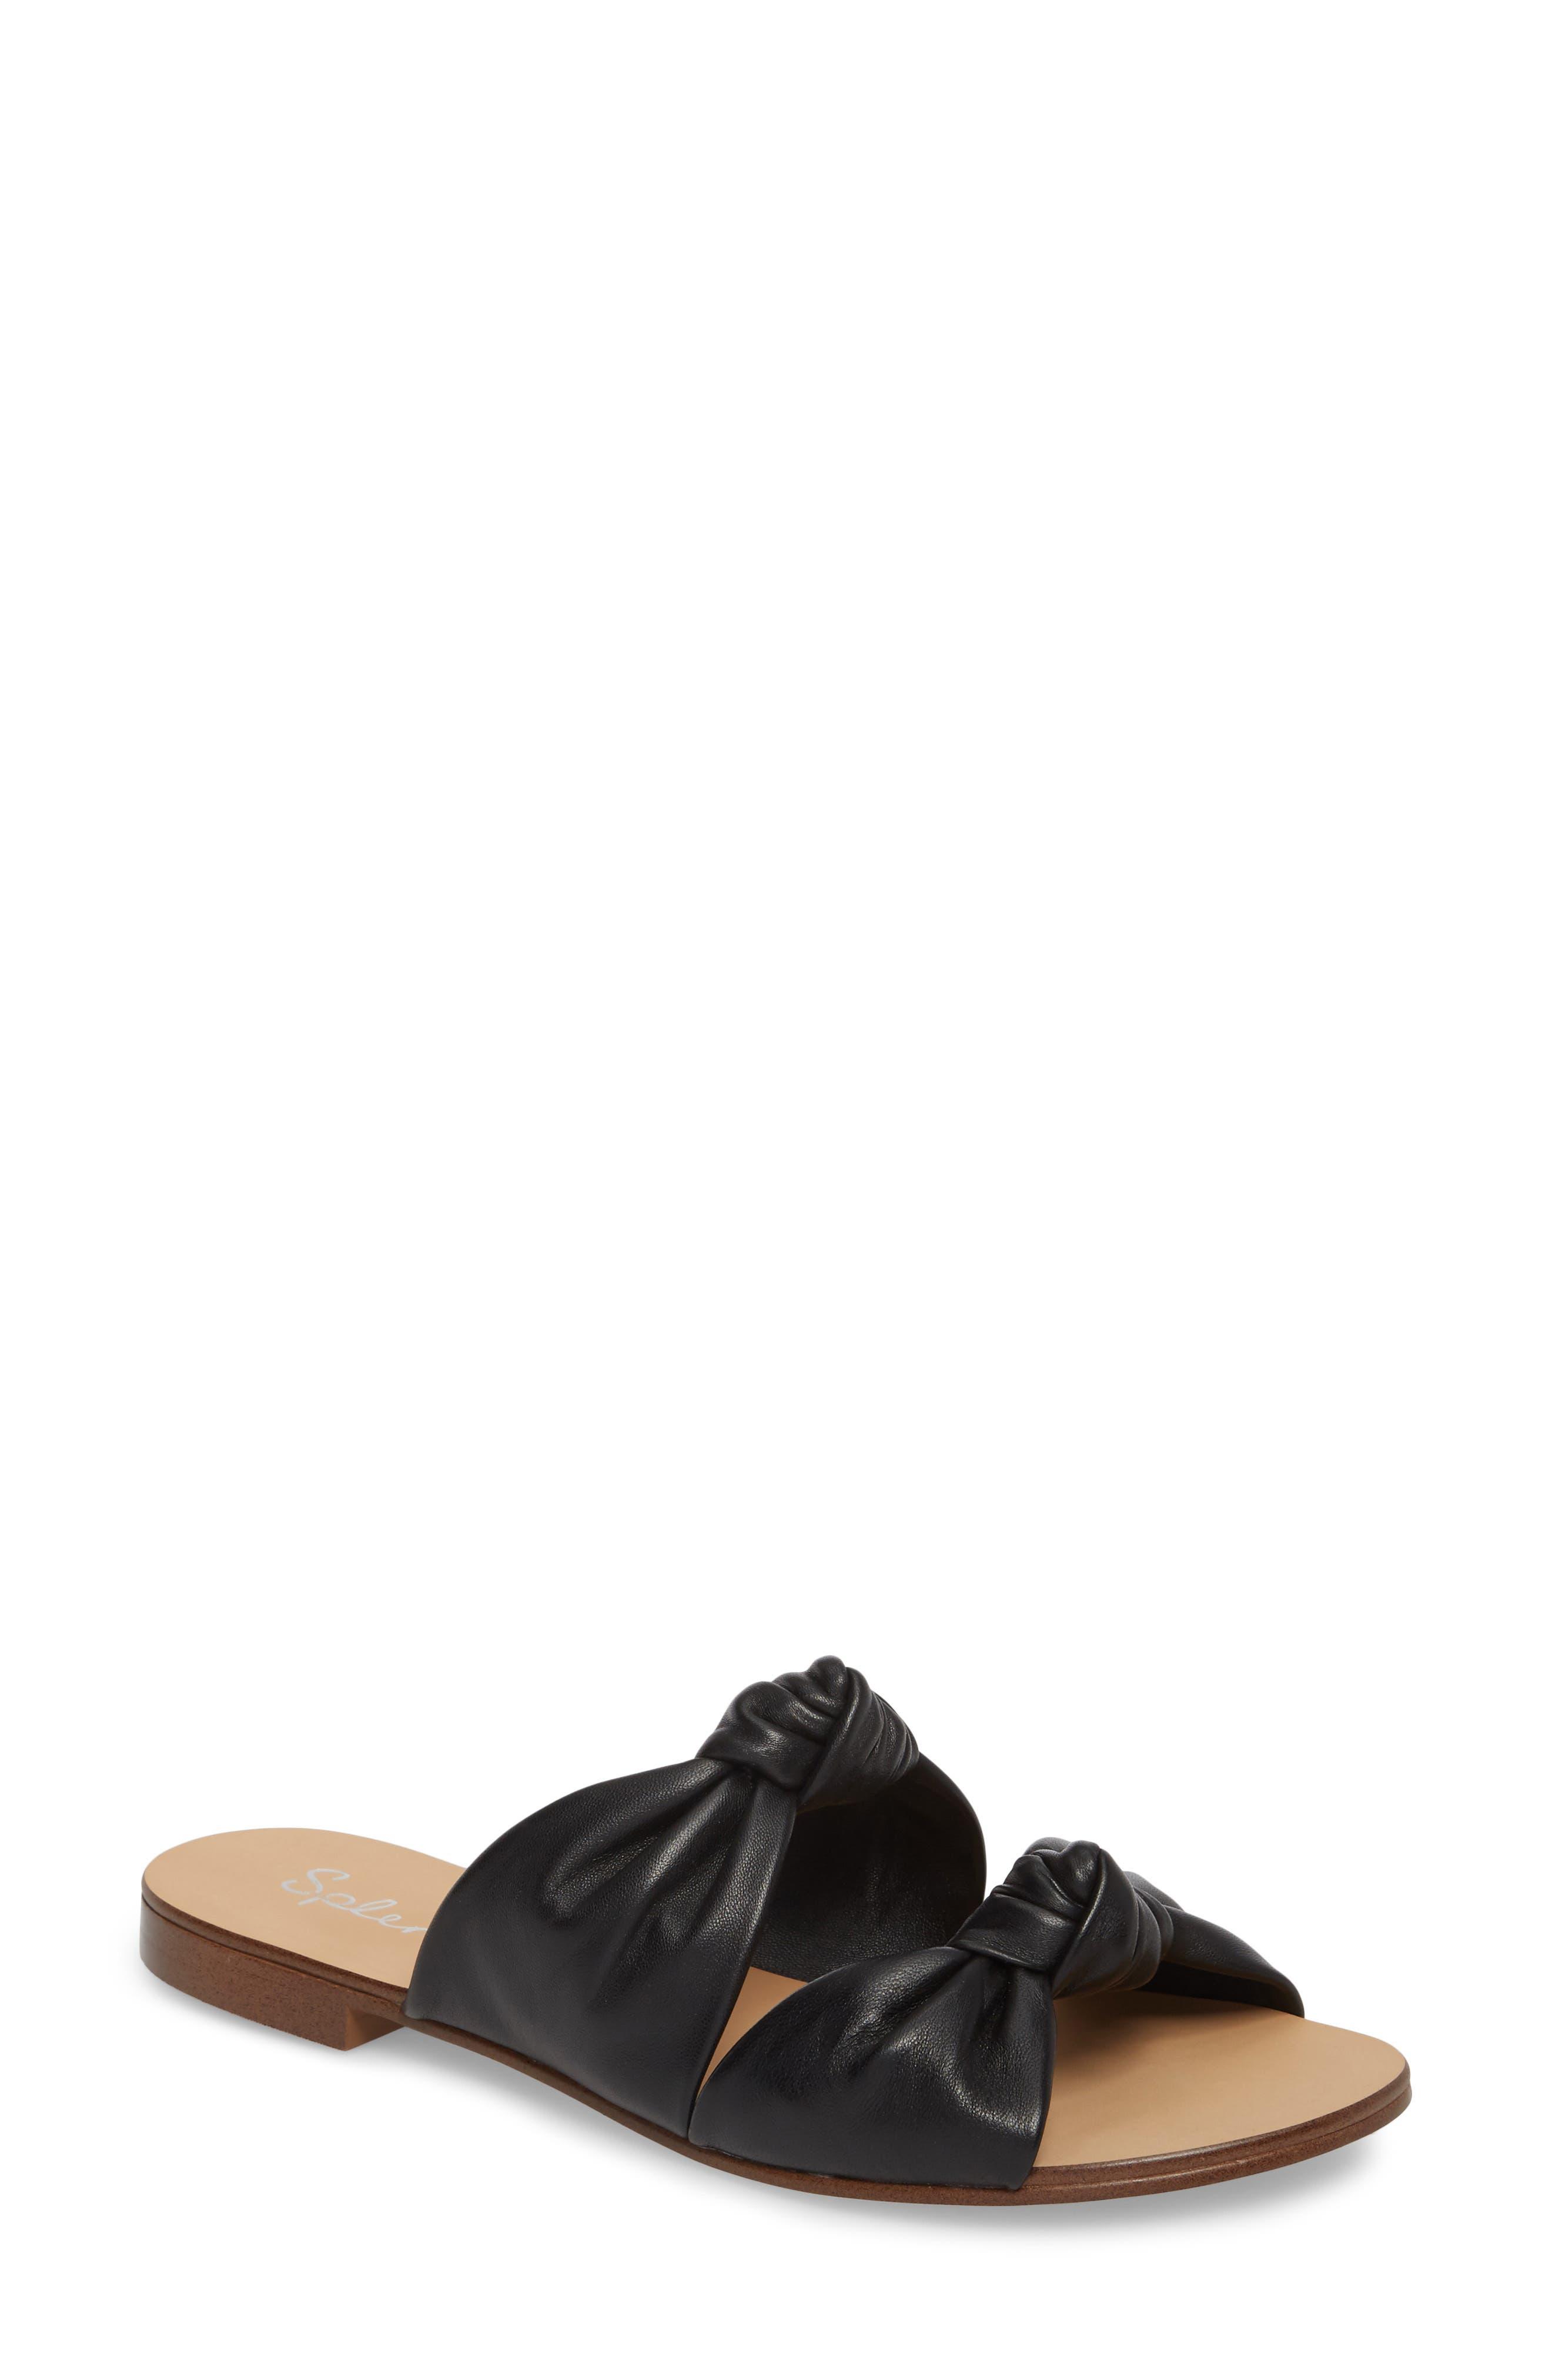 Barton Double Knotted Slide Sandal,                         Main,                         color, BLACK LEATHER